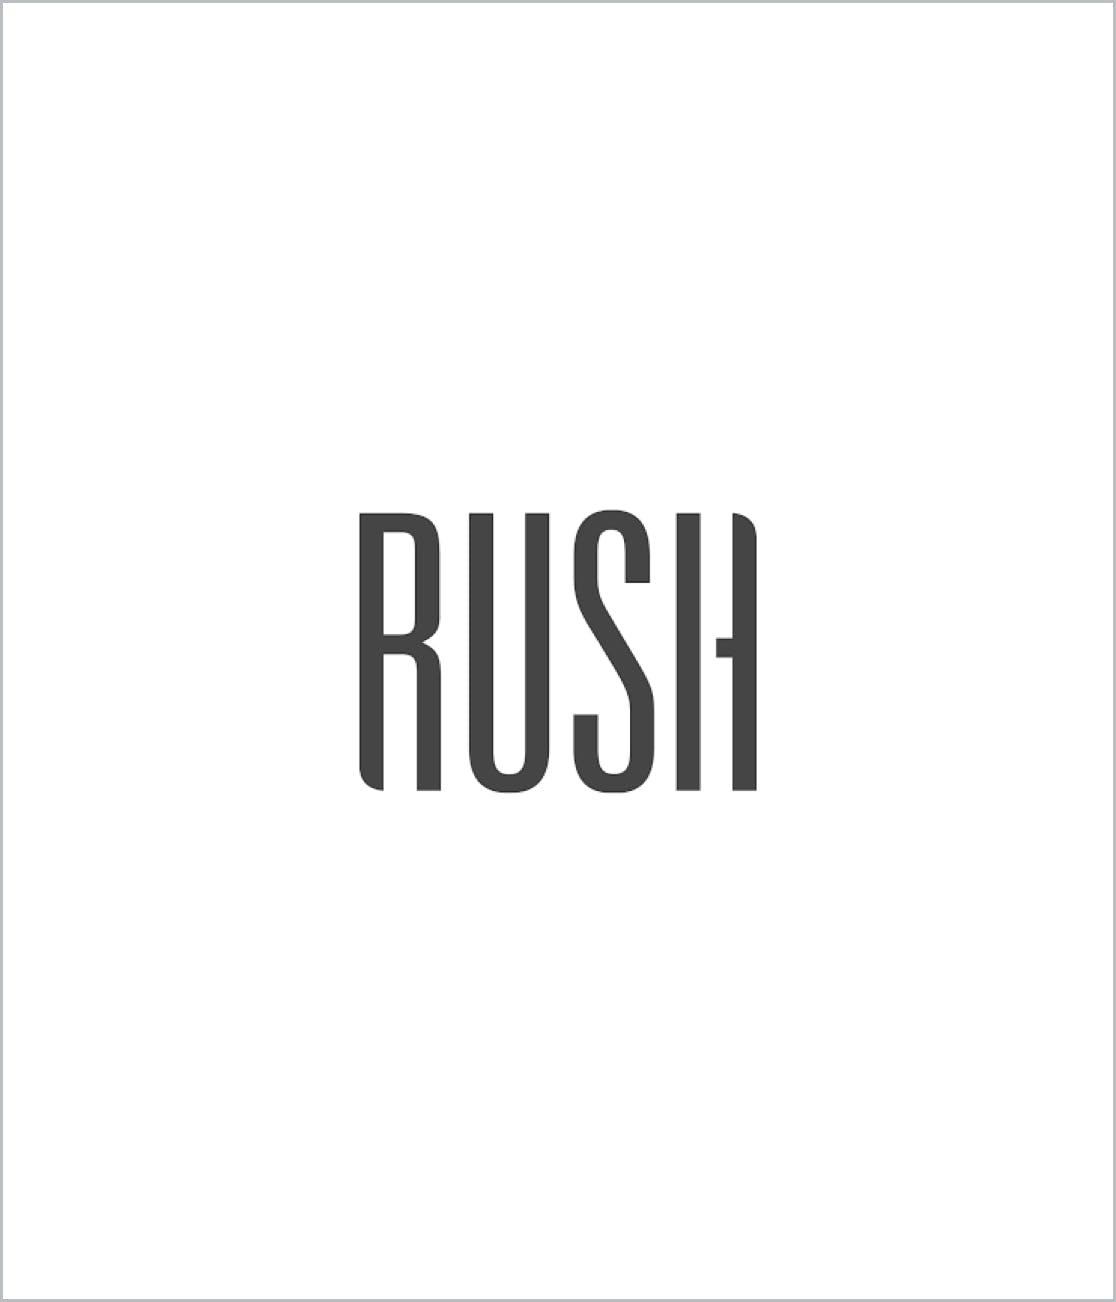 Rush Logo Supplier